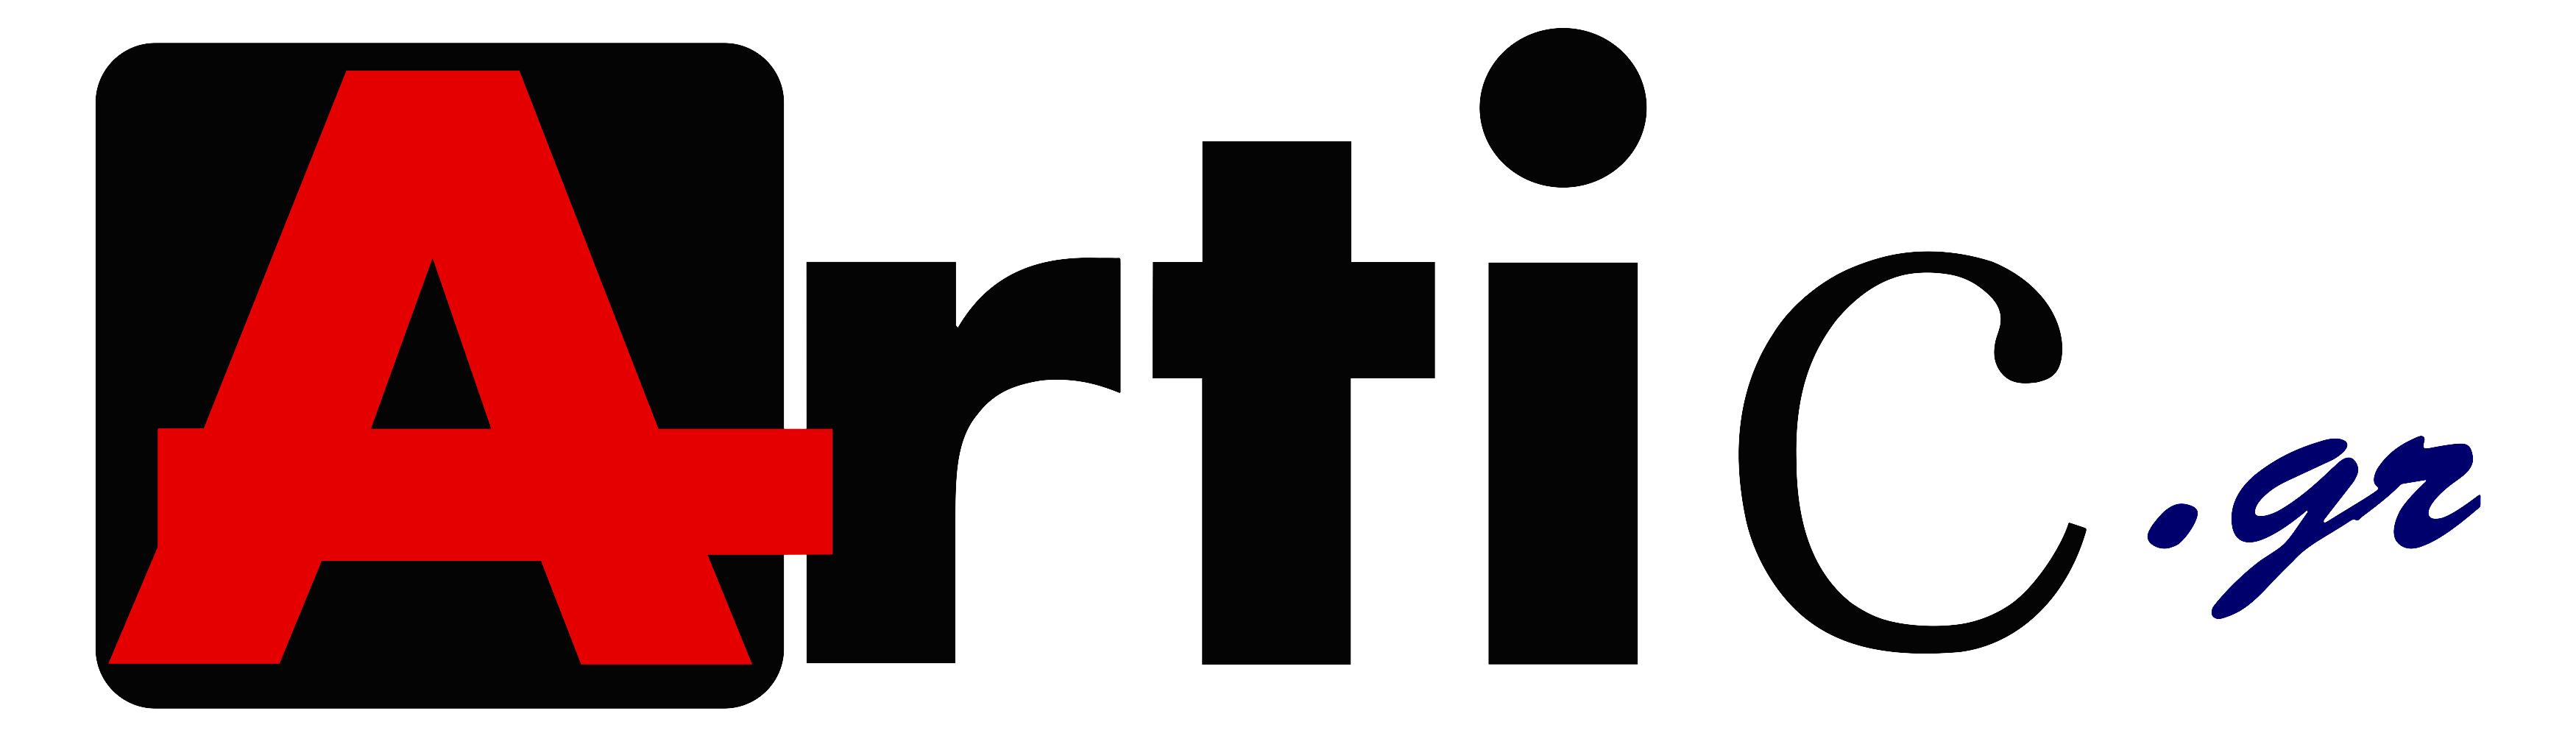 Artic-logo-whitefont-brght-hq